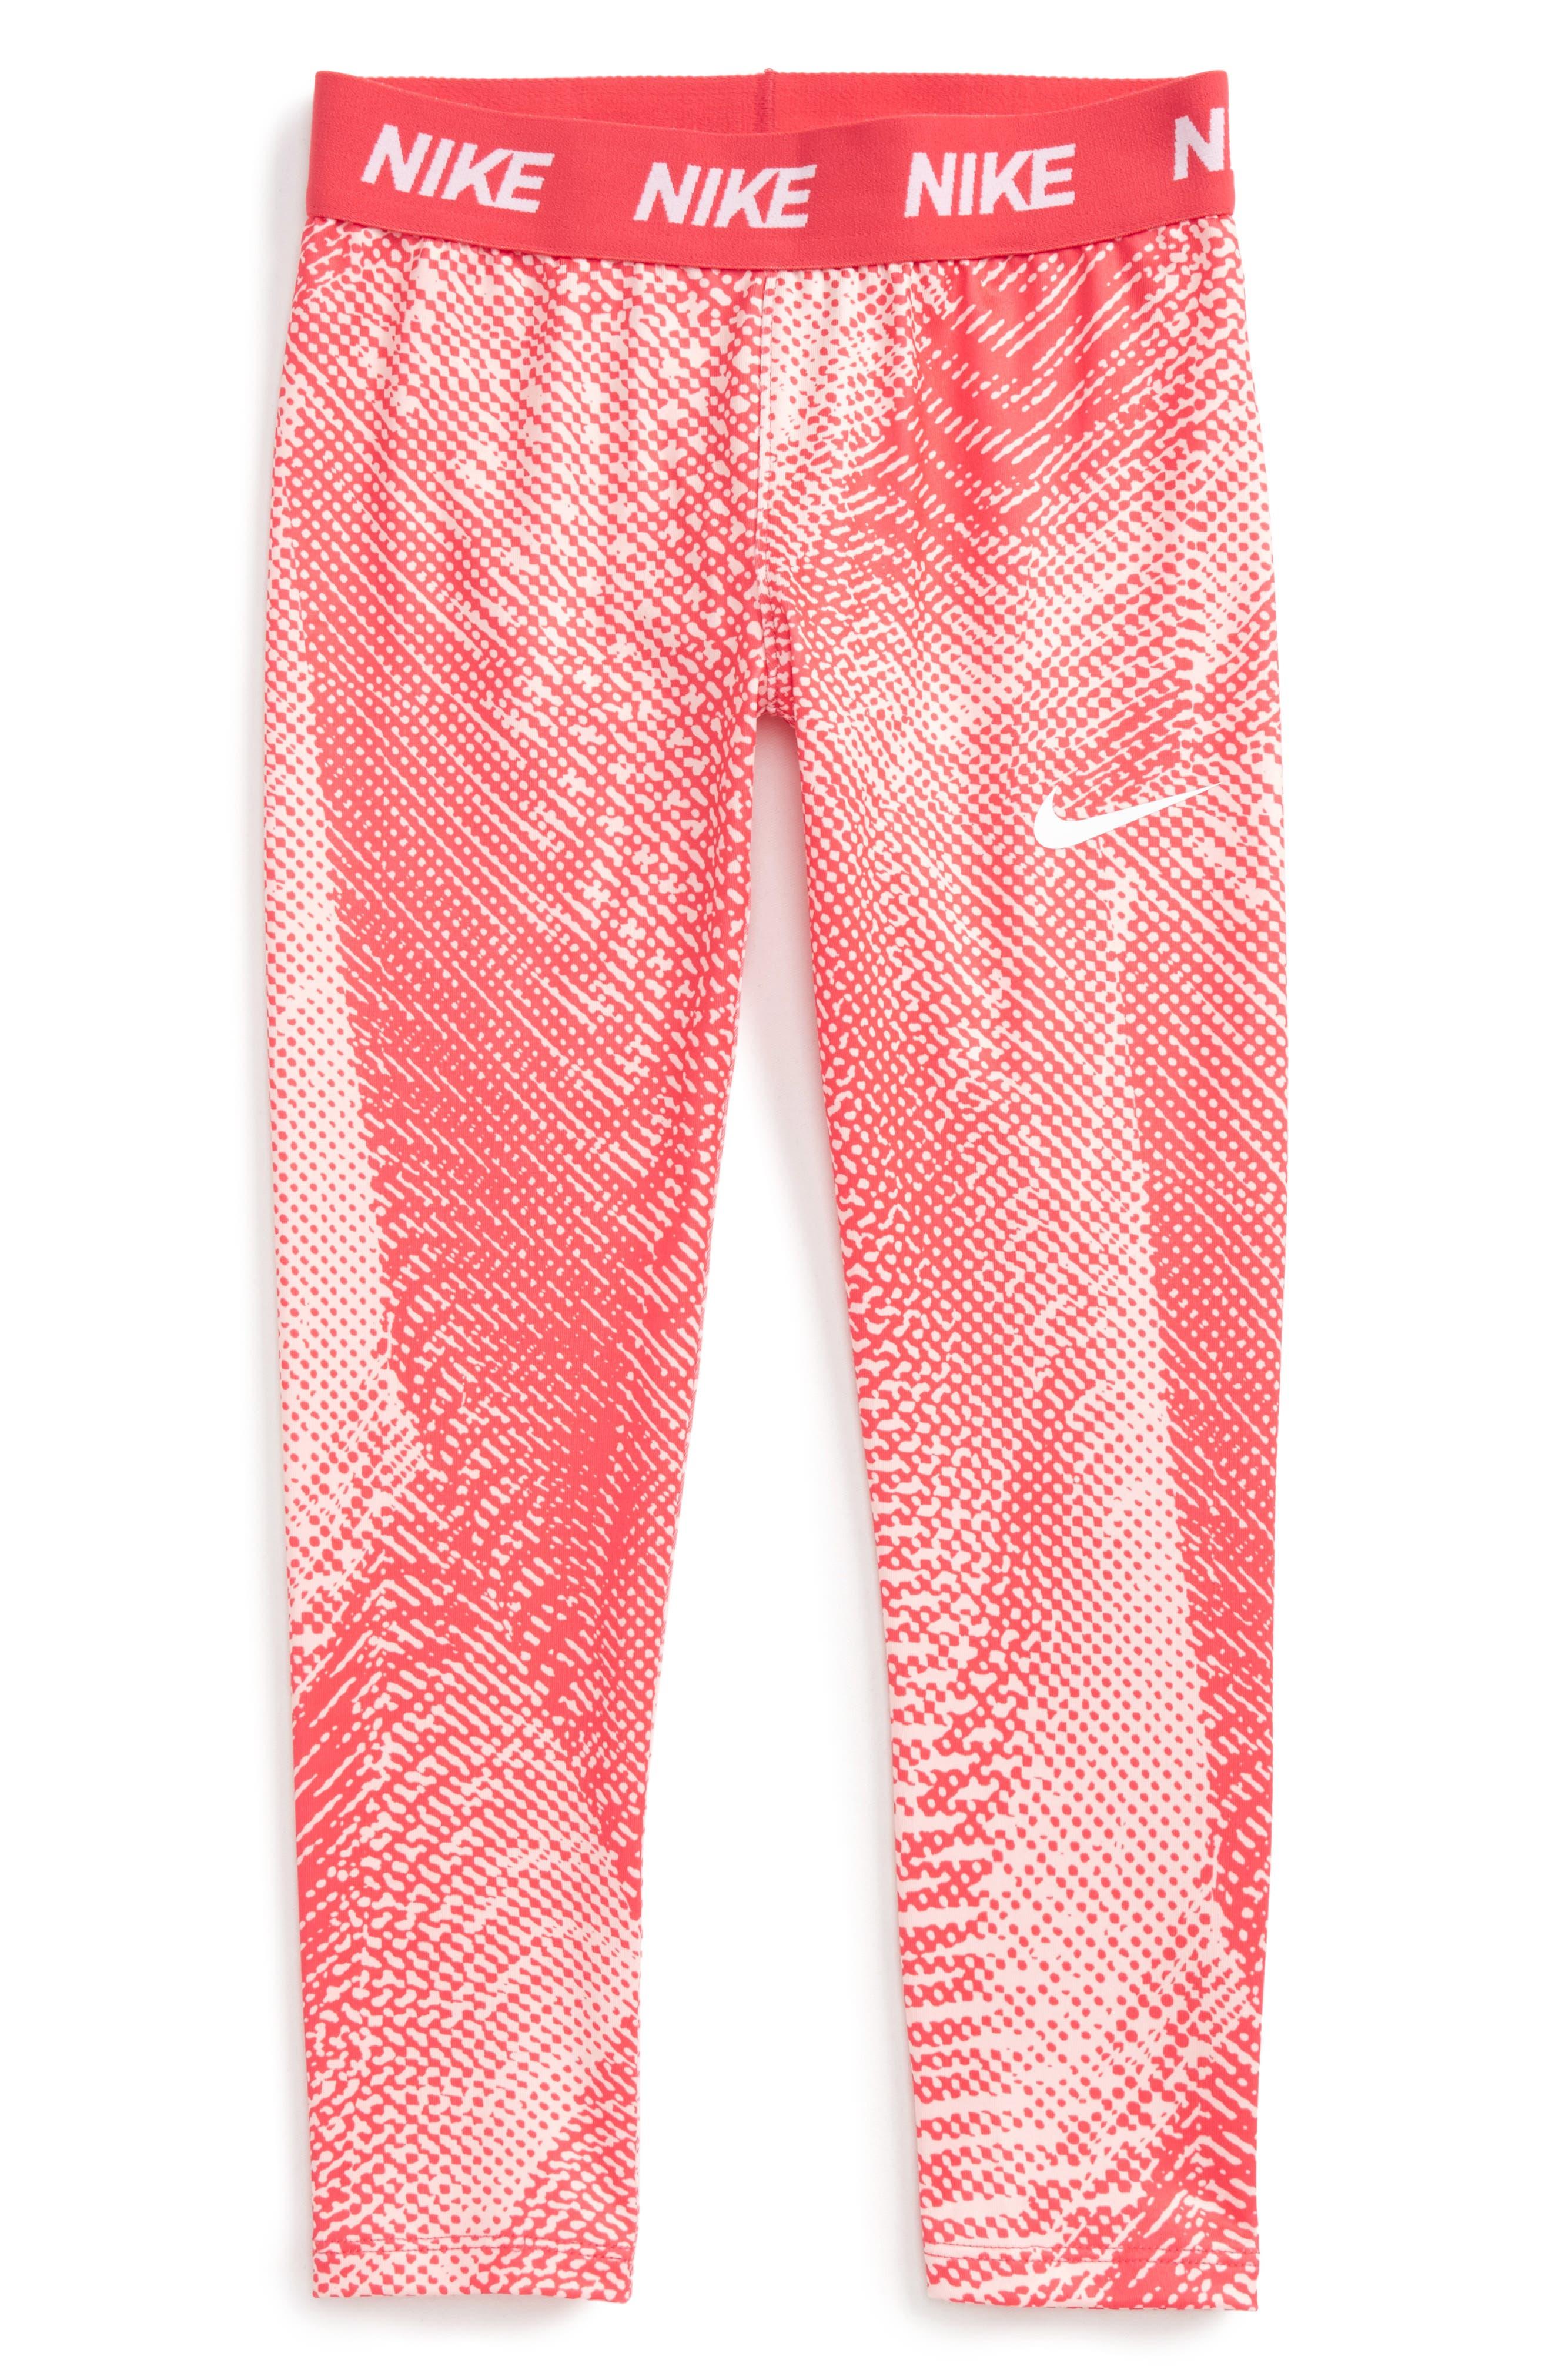 Dri-FIT Leggings,                             Main thumbnail 1, color,                             Fusion Red